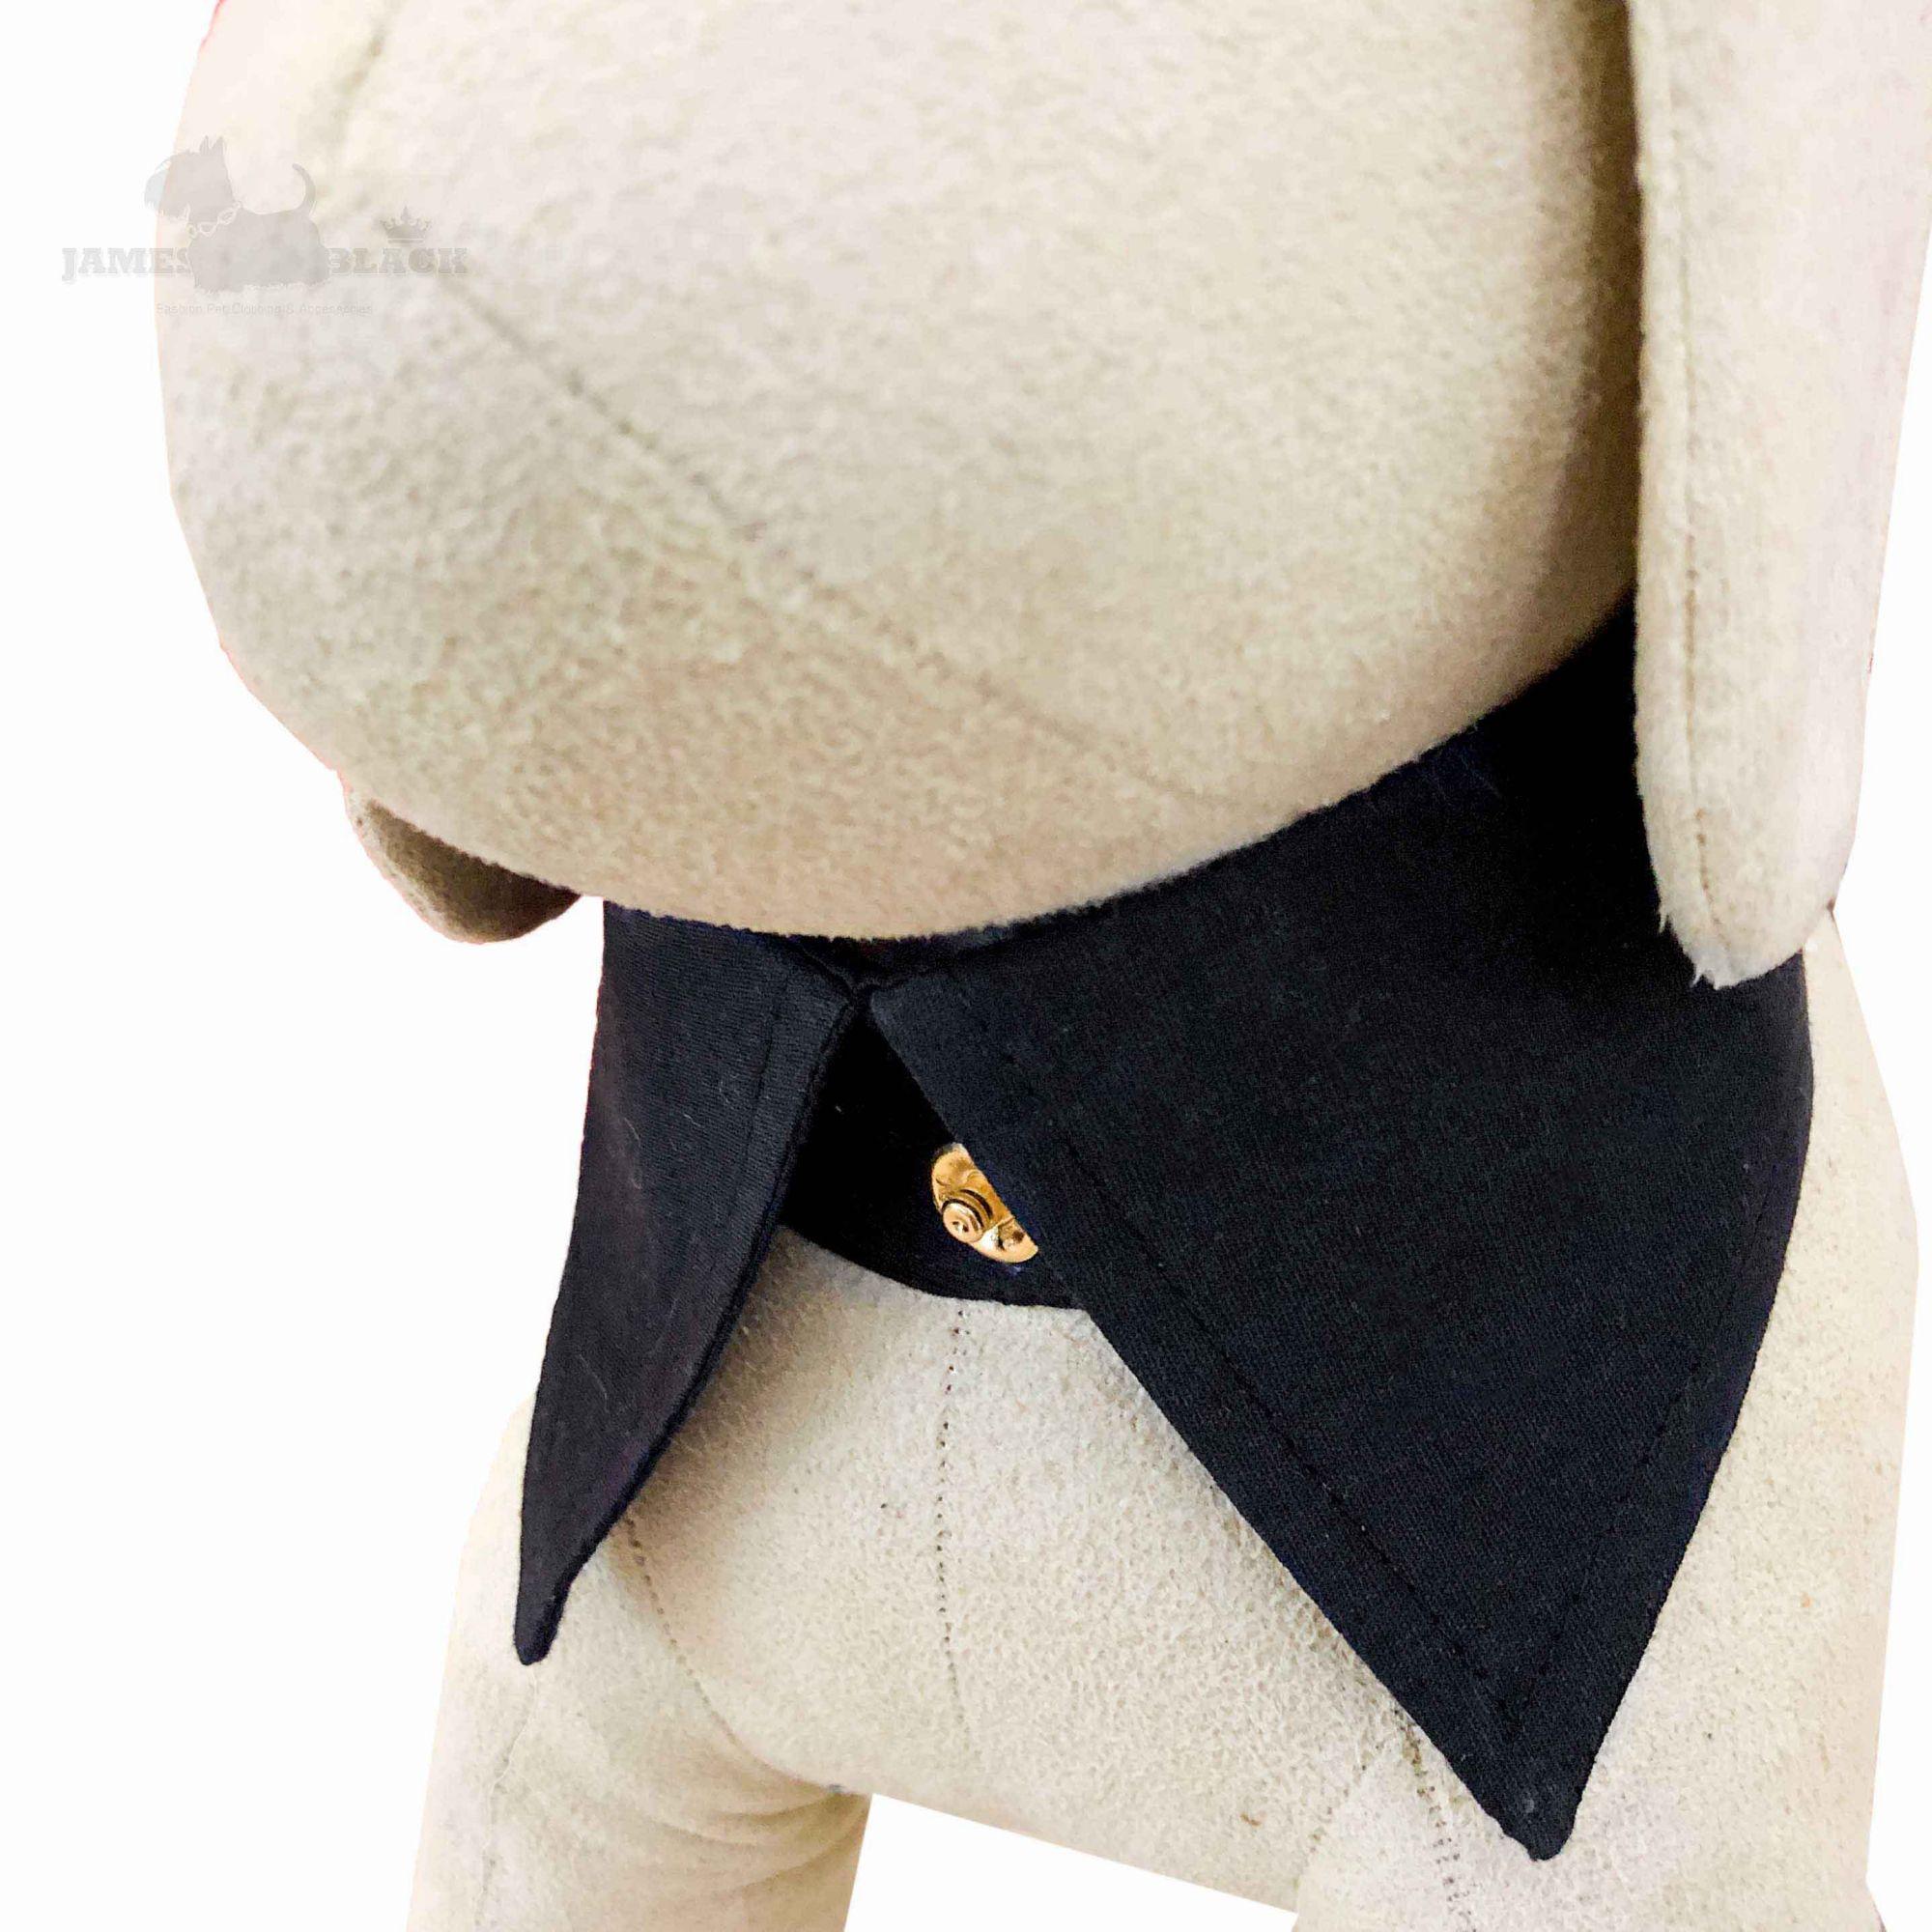 Colarinho com Gravata removível Preto